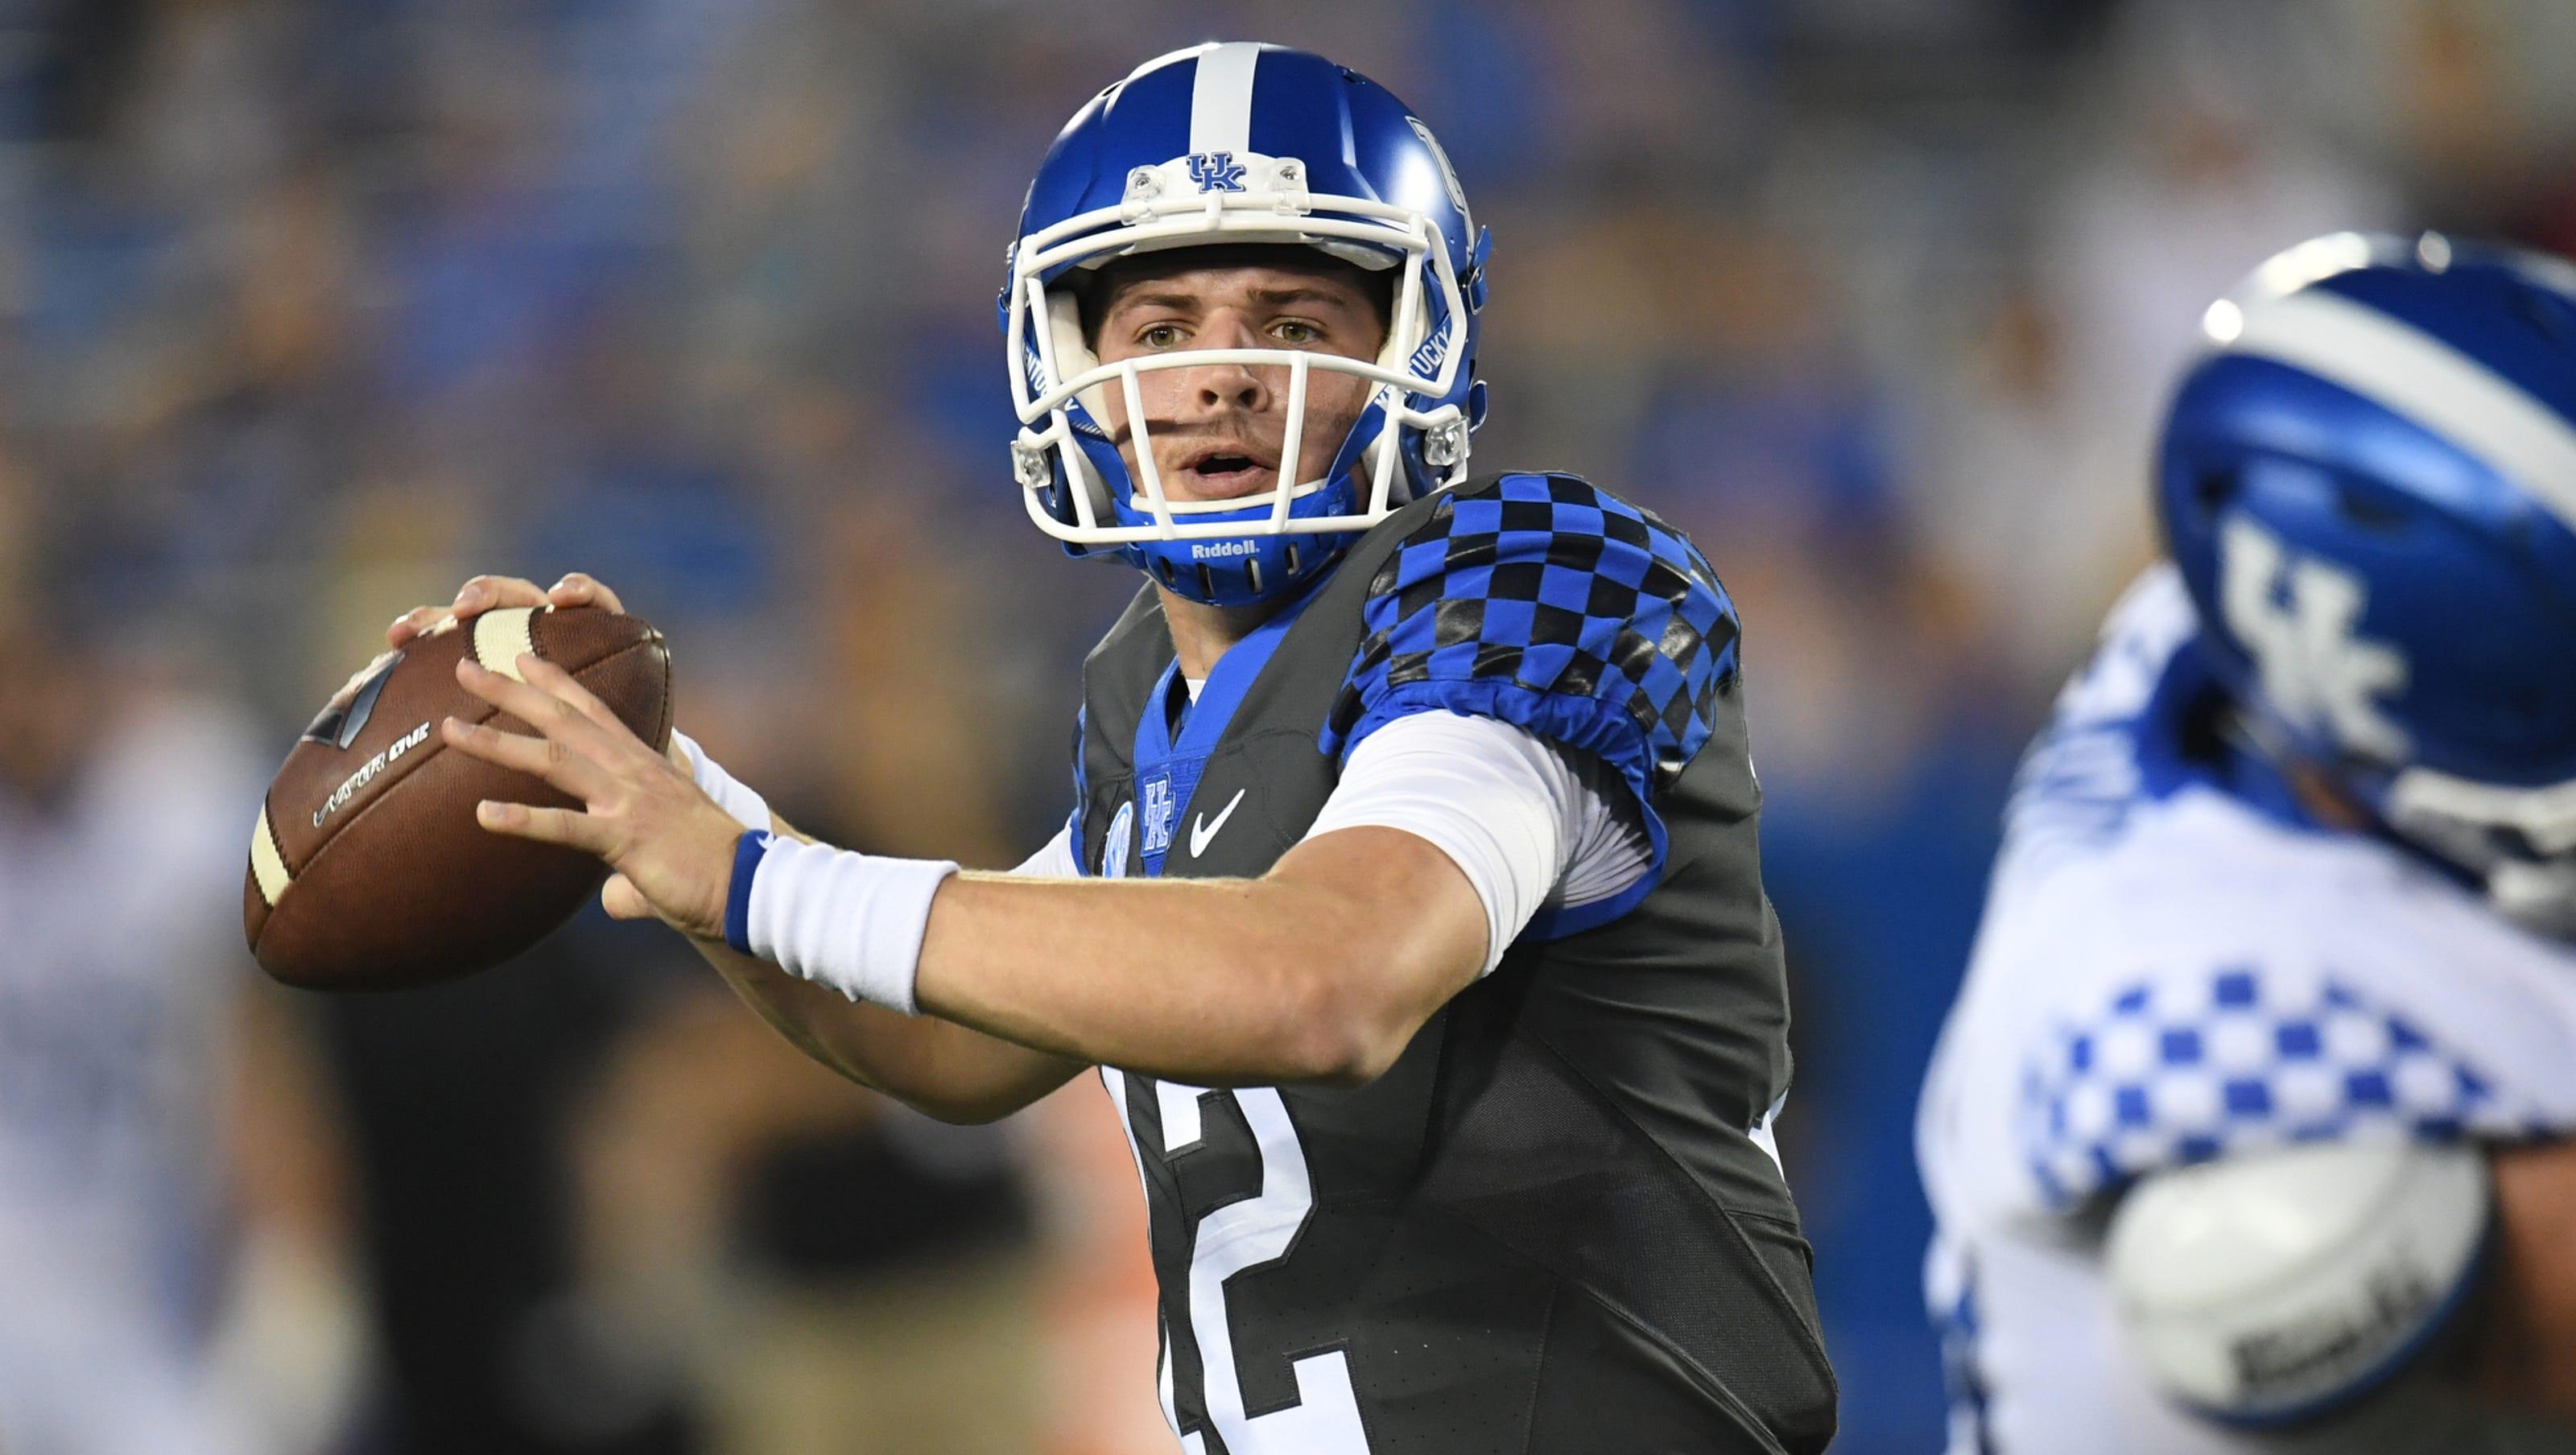 Kentucky Football Can Gunnar Hoak Run Enough To Win Qb Job